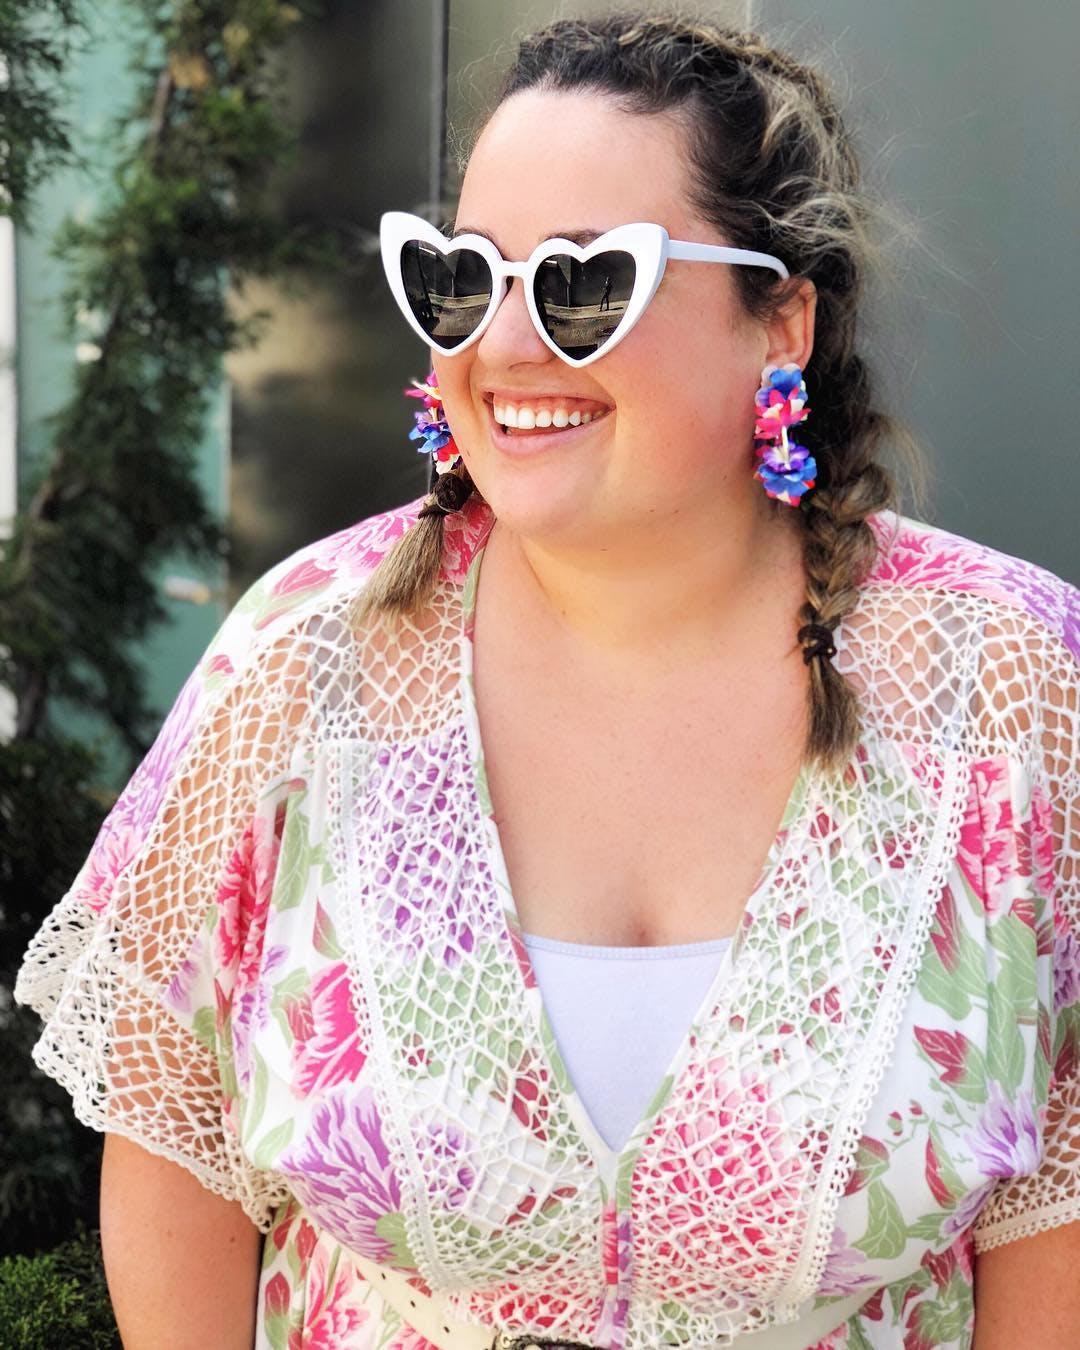 a woman wearing fun heart shaped sunglasses